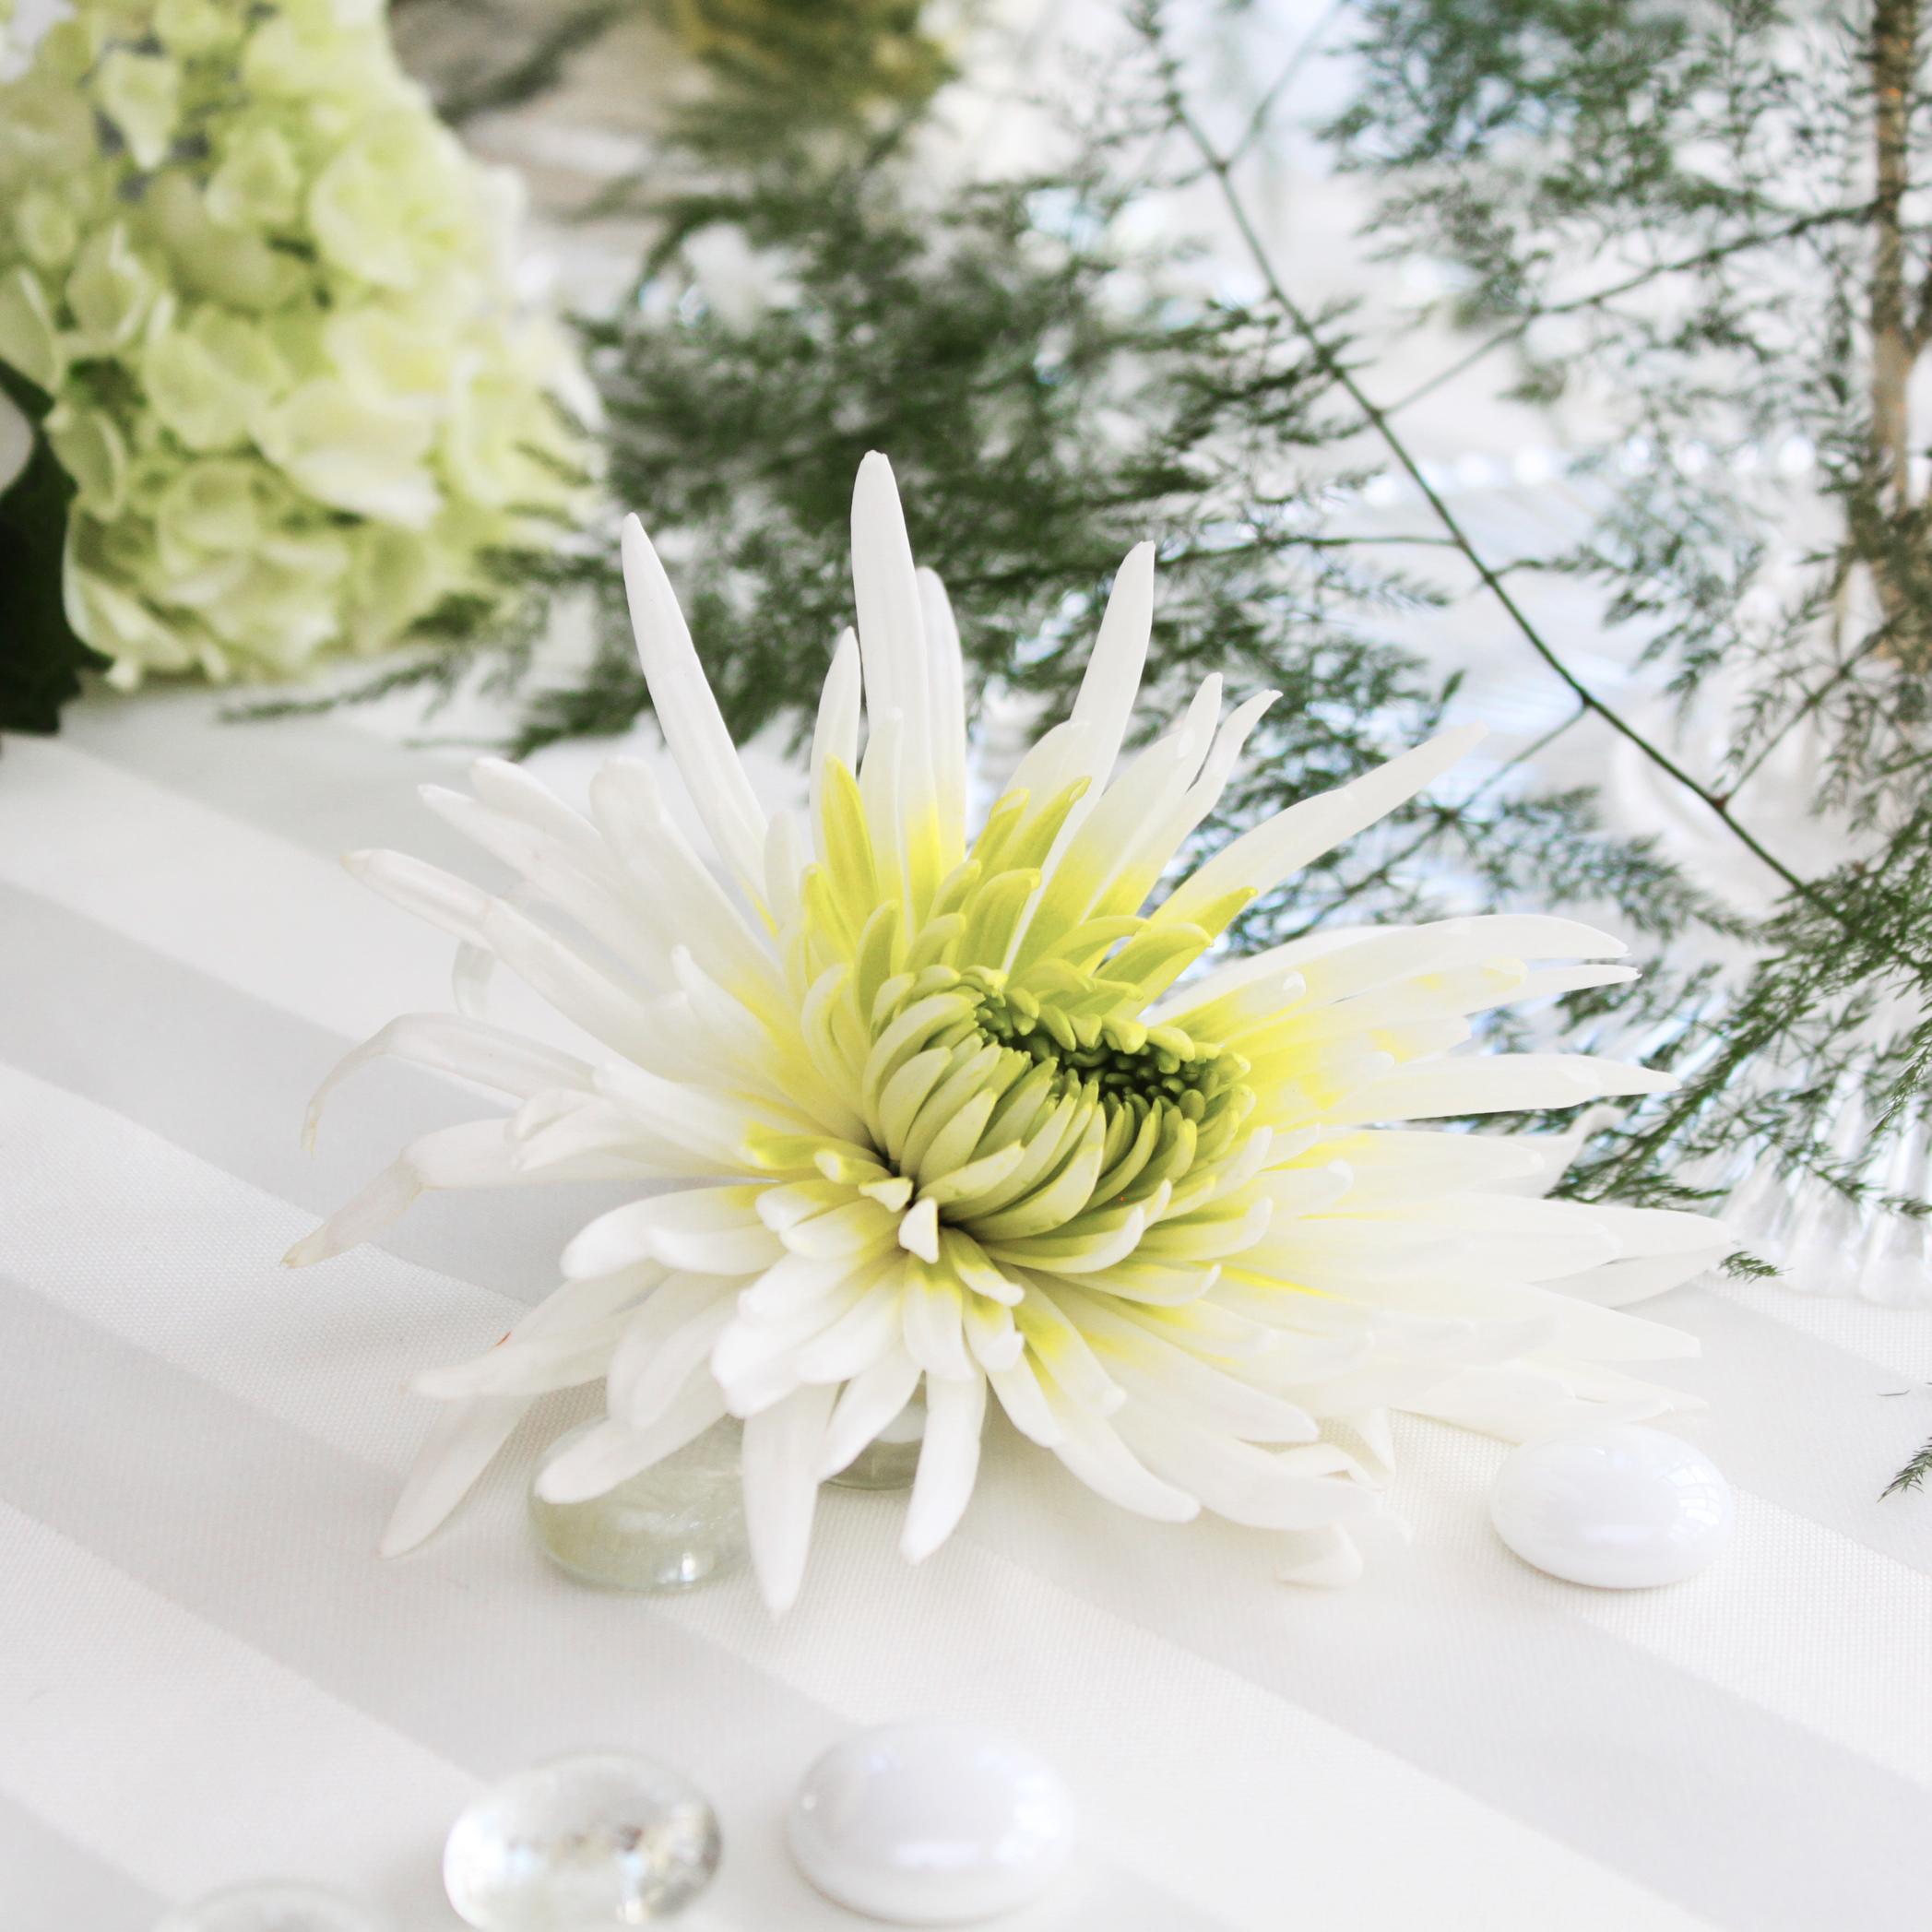 Free photo white flowers wed wedding pure free download jooinn white flowers wed wedding pure white hq photo mightylinksfo